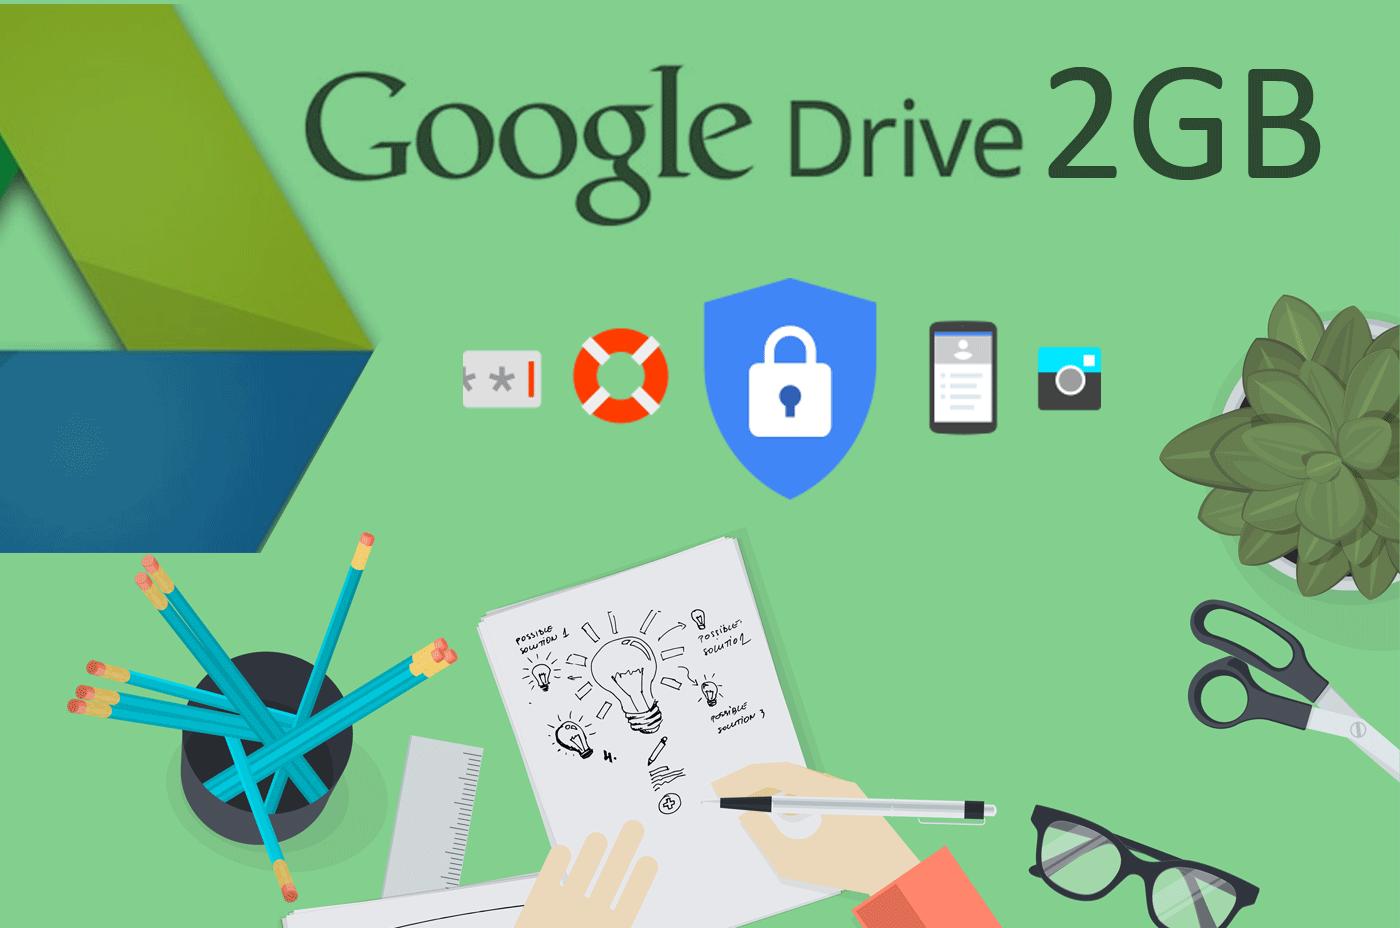 Google Gives free 2GB